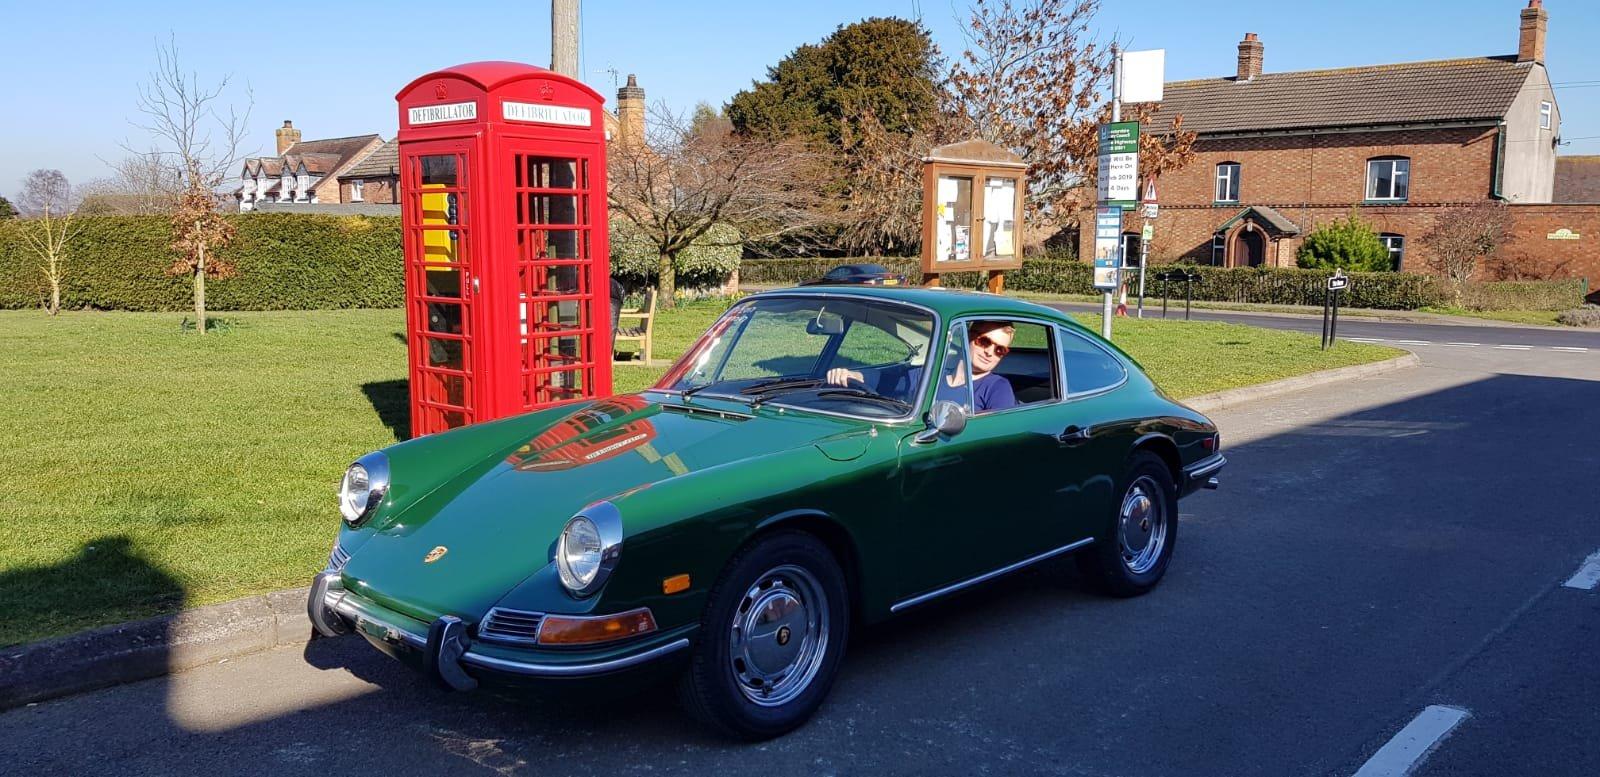 Porsche 912 1968 For Sale (picture 1 of 1)